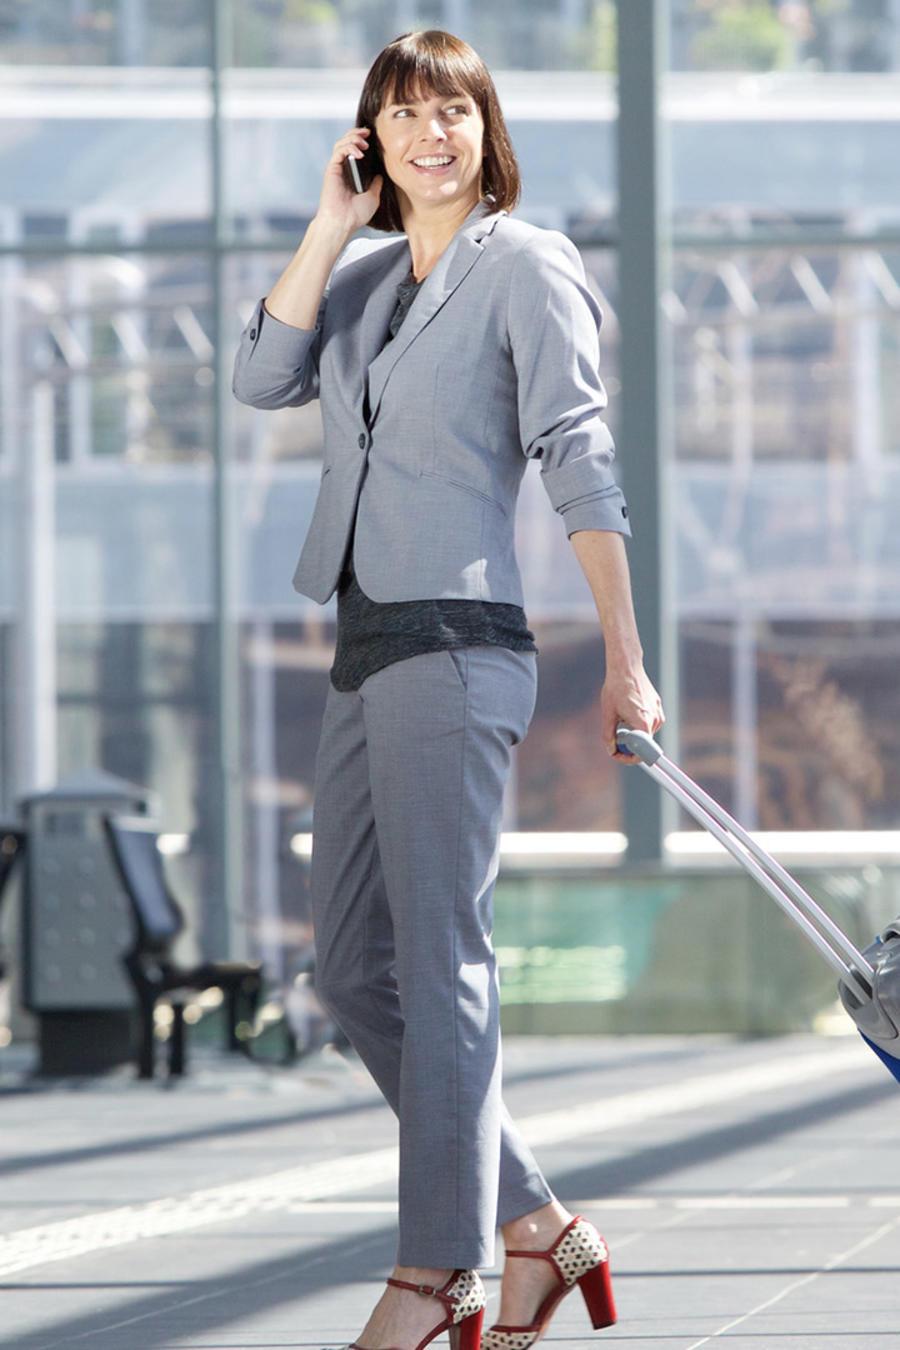 Viajera profesional en aeropuerto